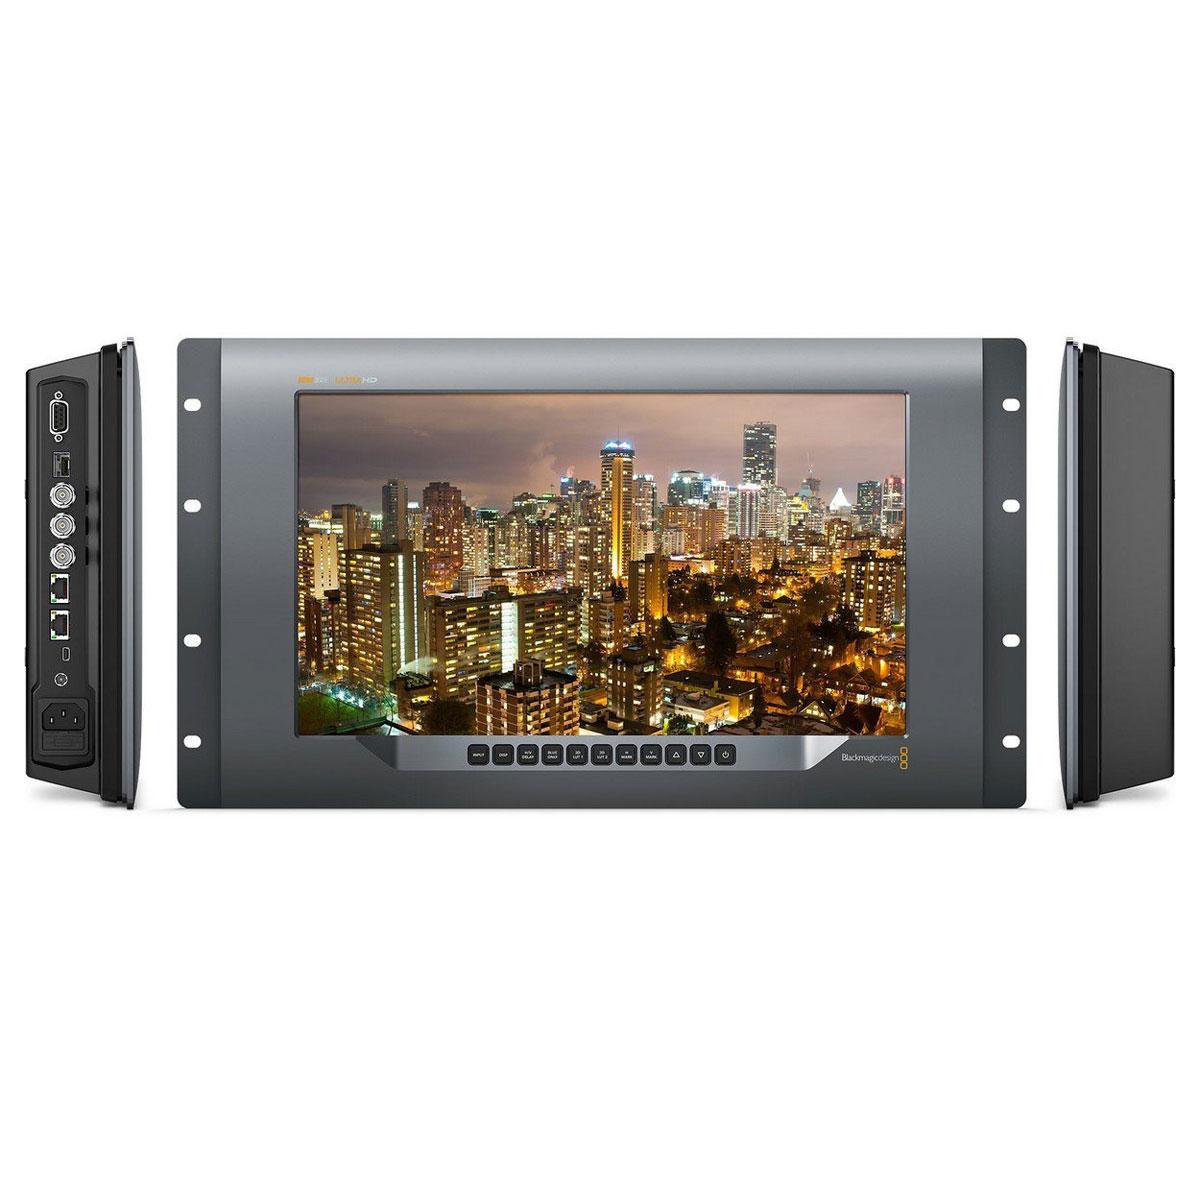 blackmagic design smartview 4k ecran pc blackmagic. Black Bedroom Furniture Sets. Home Design Ideas